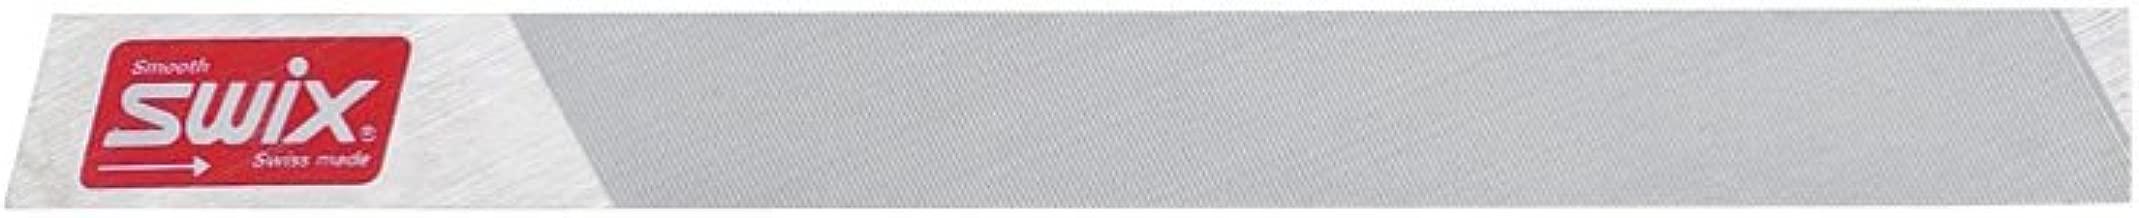 Swix Race Tech File: Smooth: 15 cm: 20 Tpcm